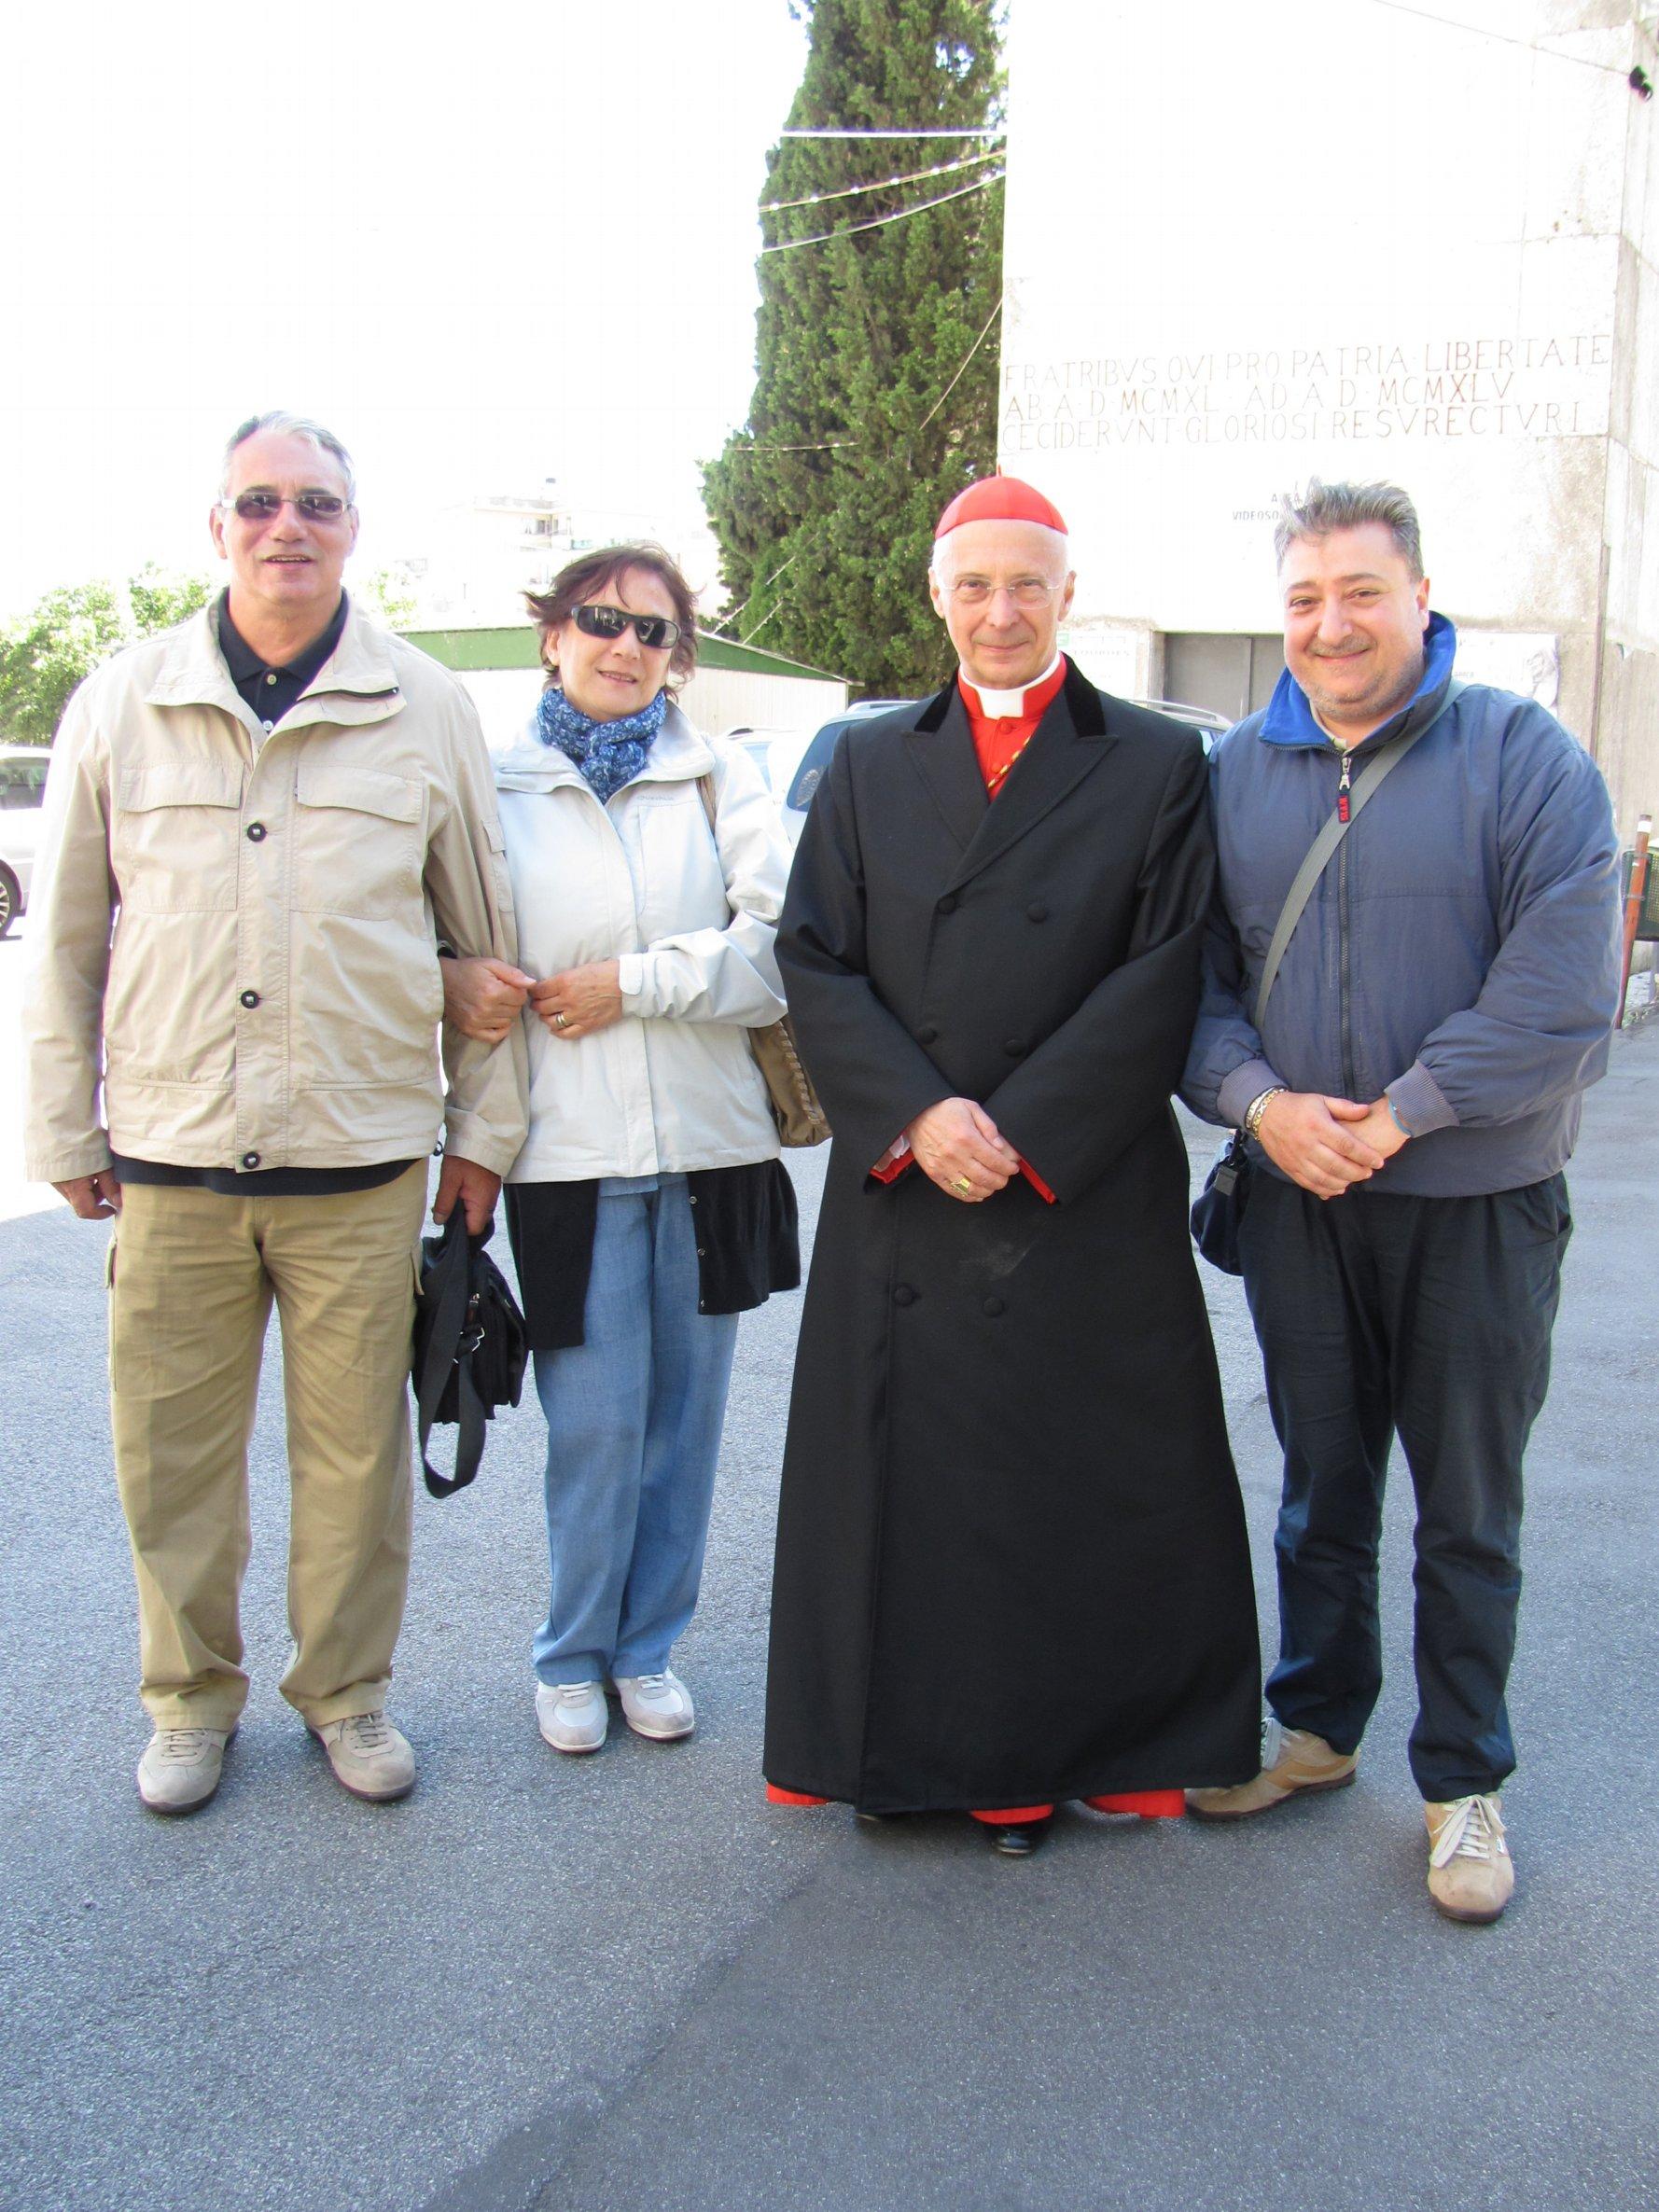 bagnasco_e_famiglie_vicariato_2013-05-26-14-34-12